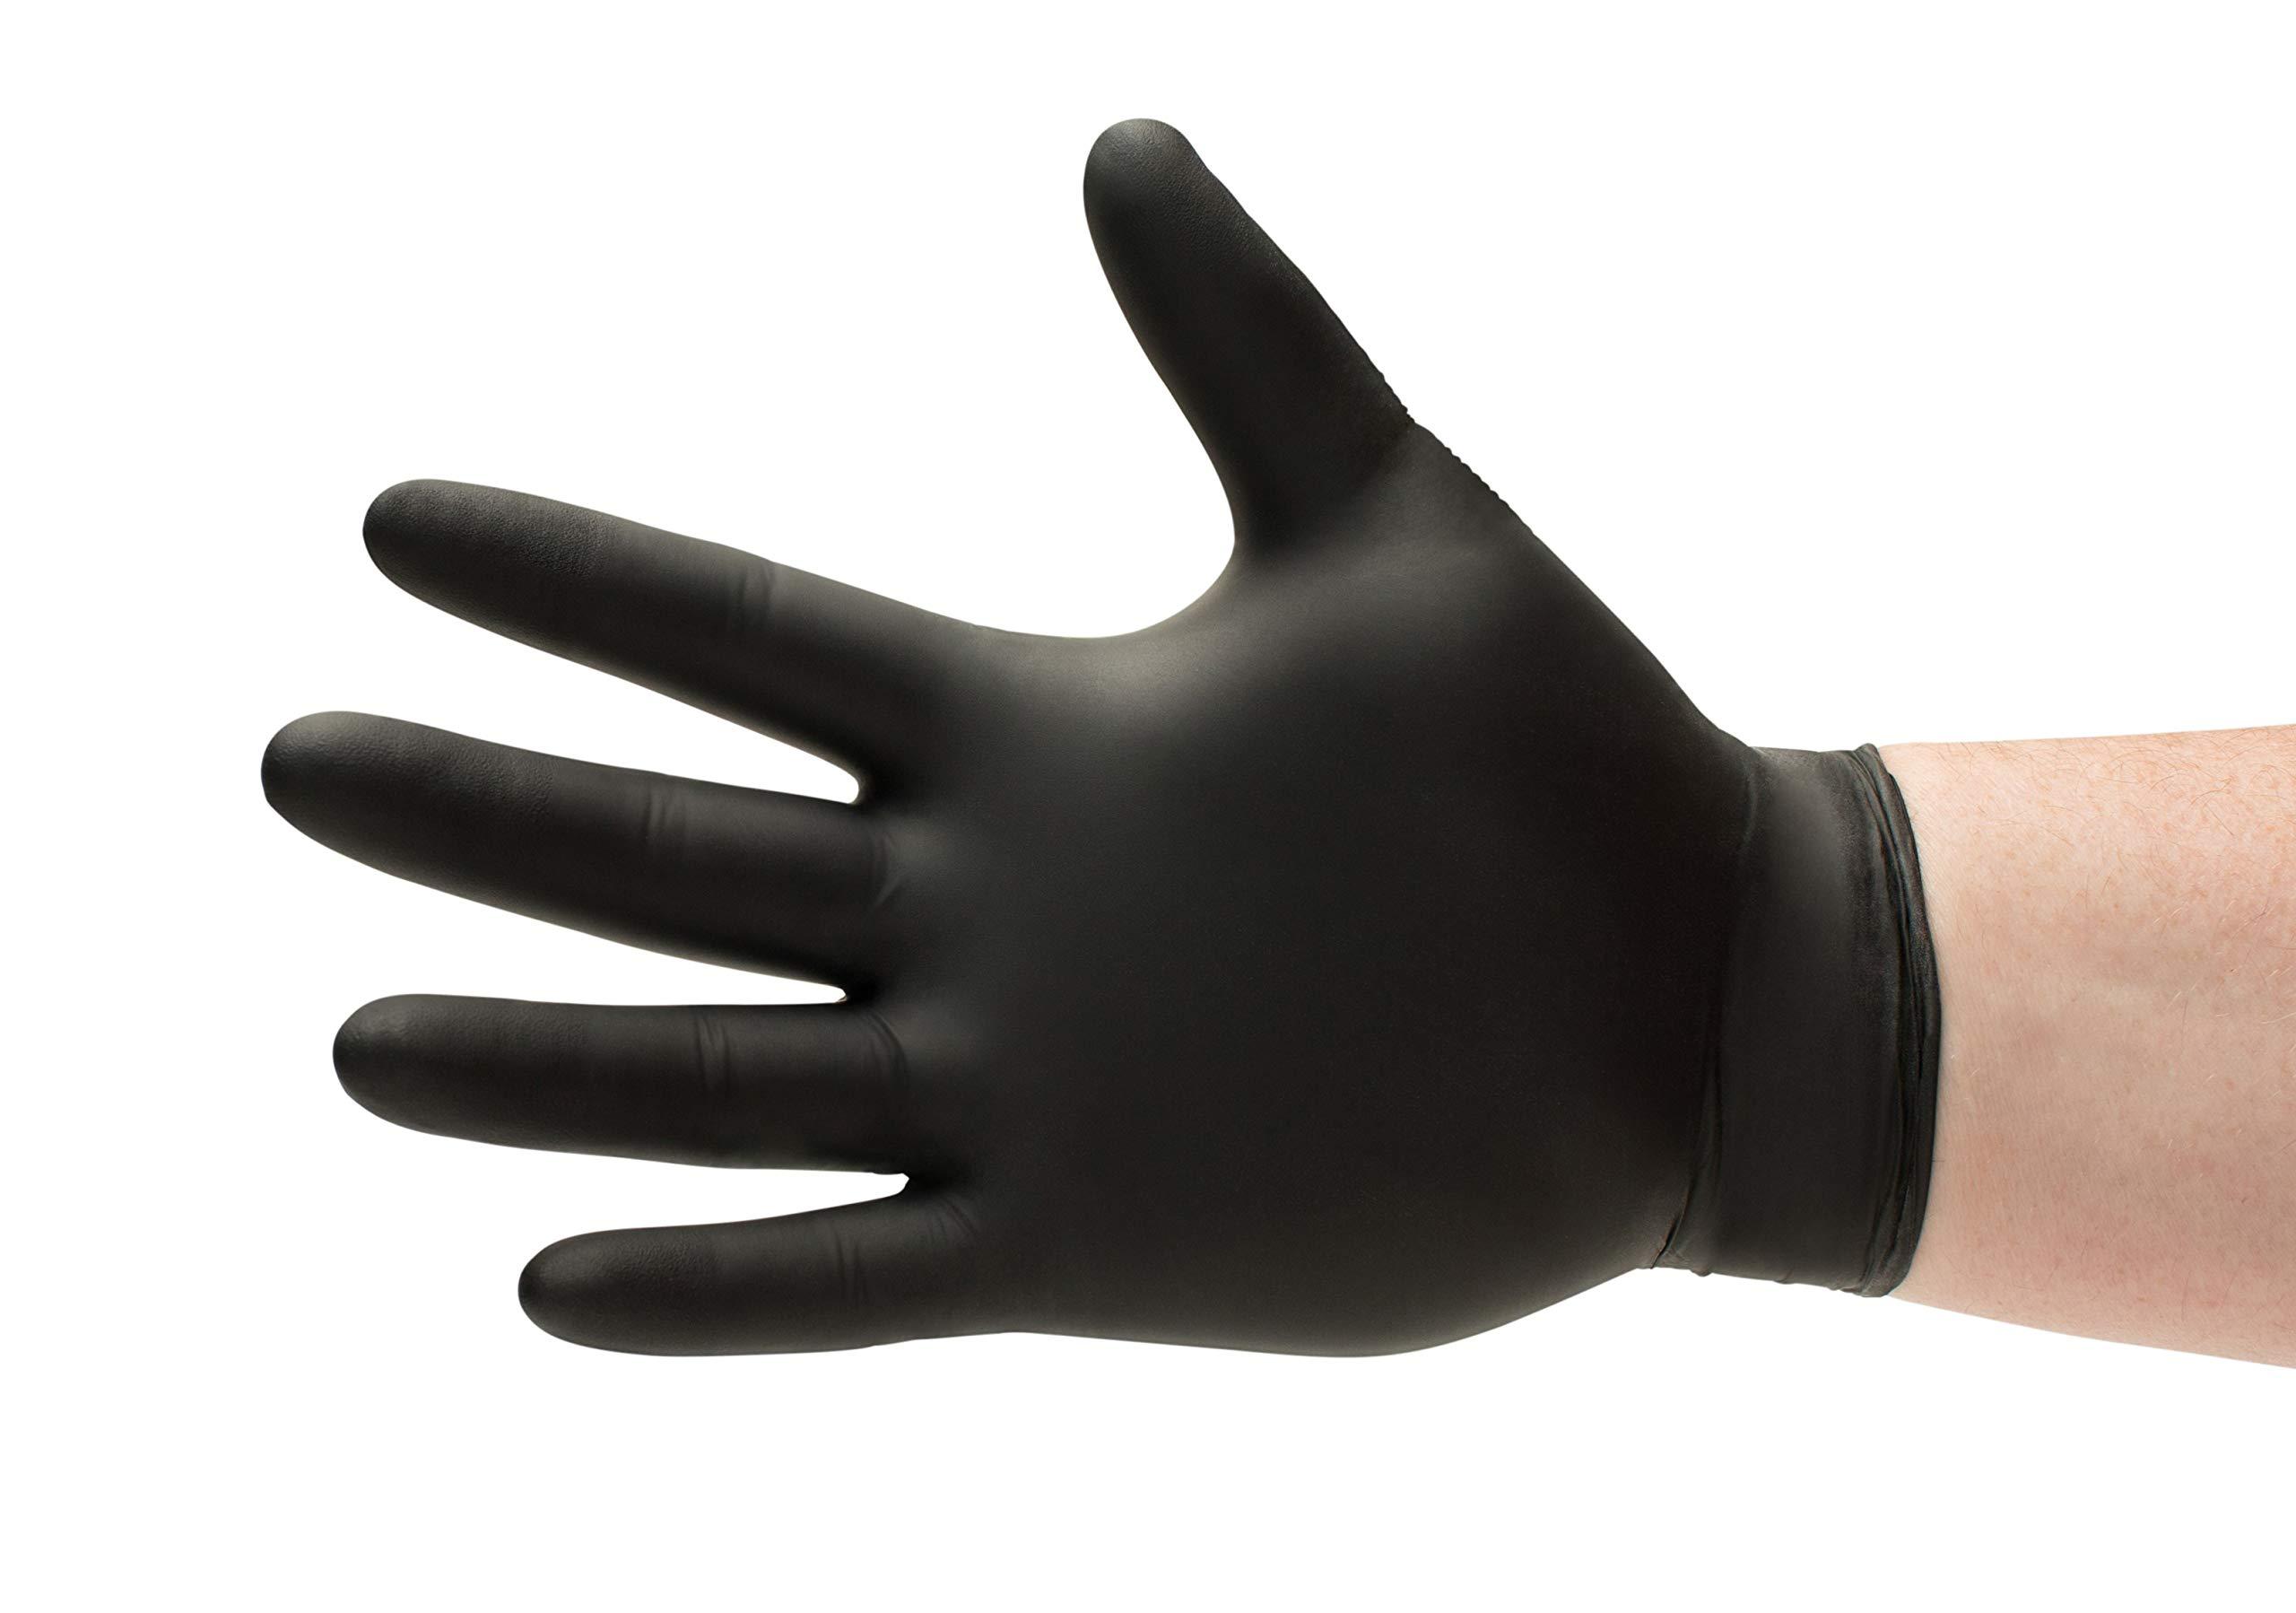 Black Nitrile Medical Exam Grade Gloves Powder Free 5 Mil X-Large 1000 Pieces (10 Boxes)